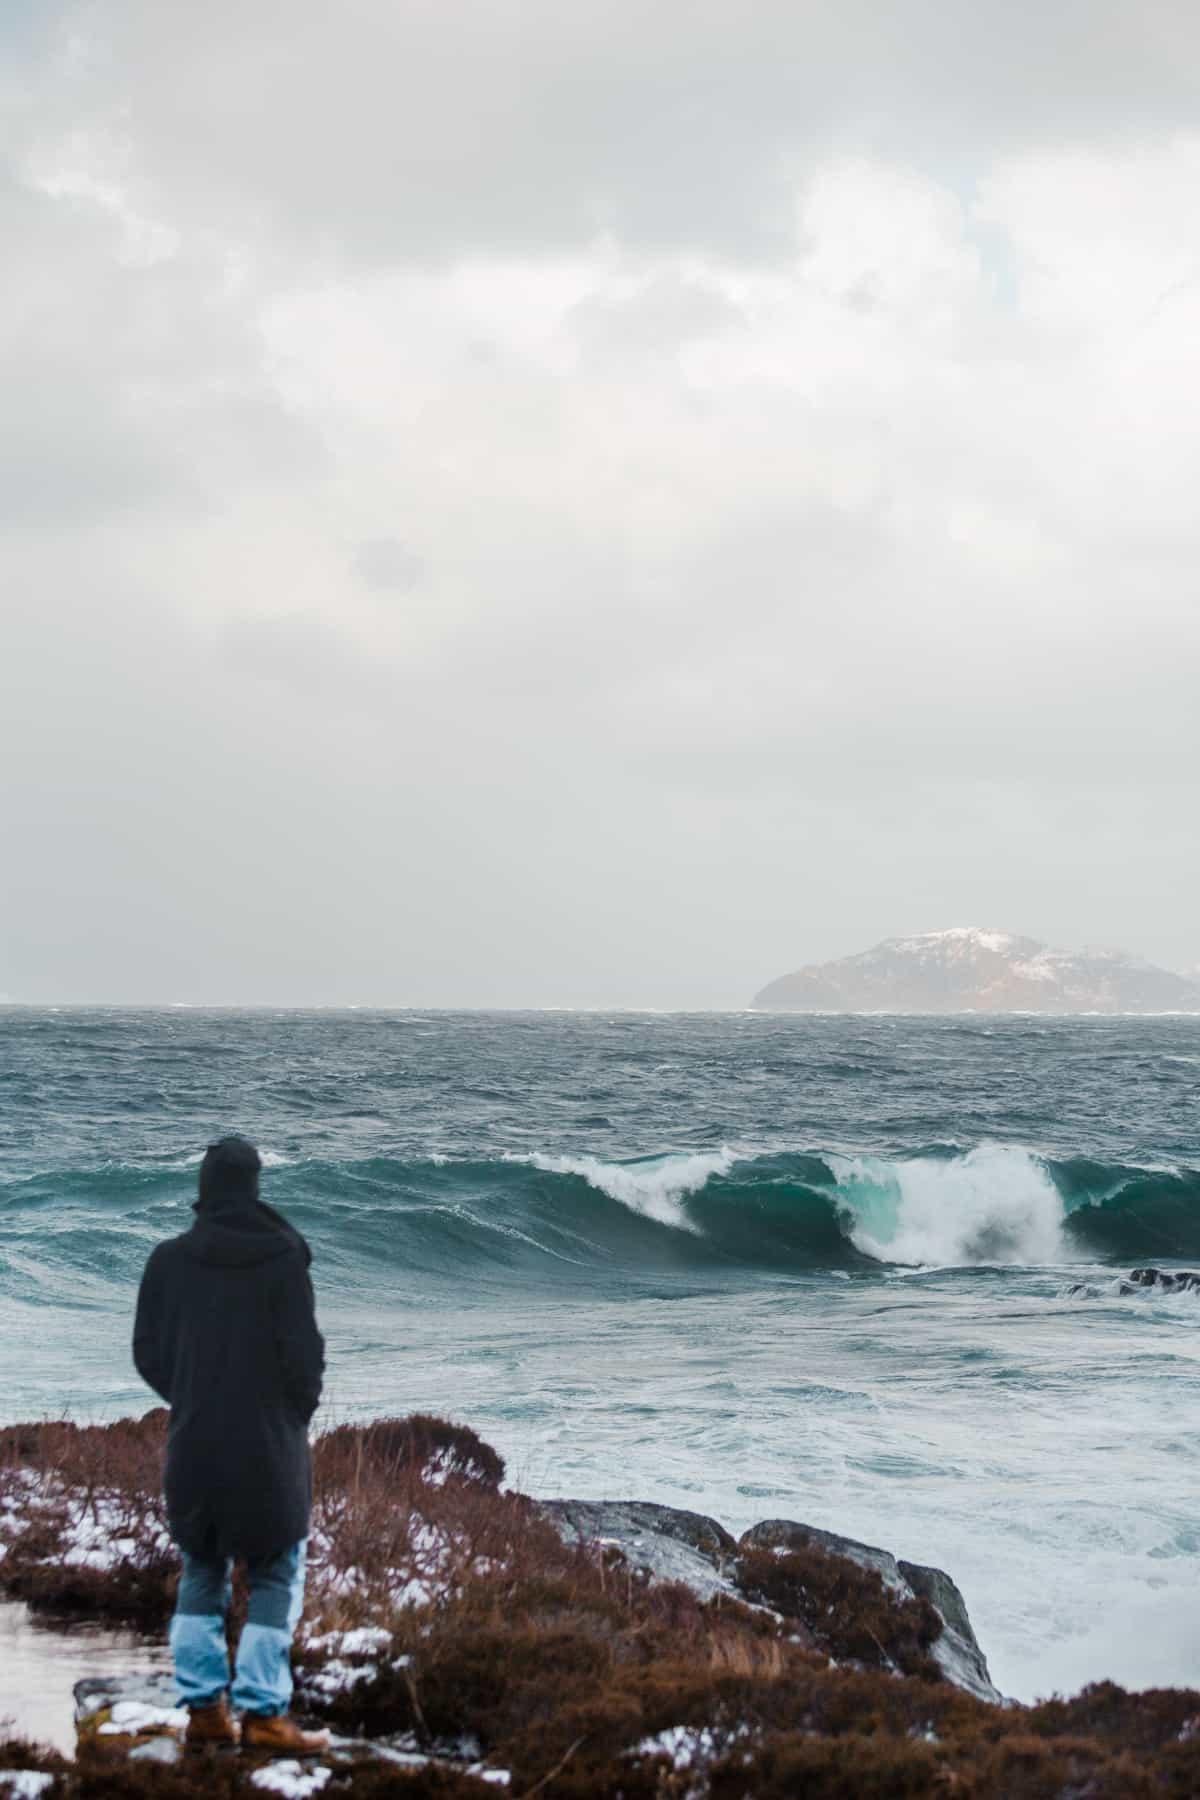 bølge bryter